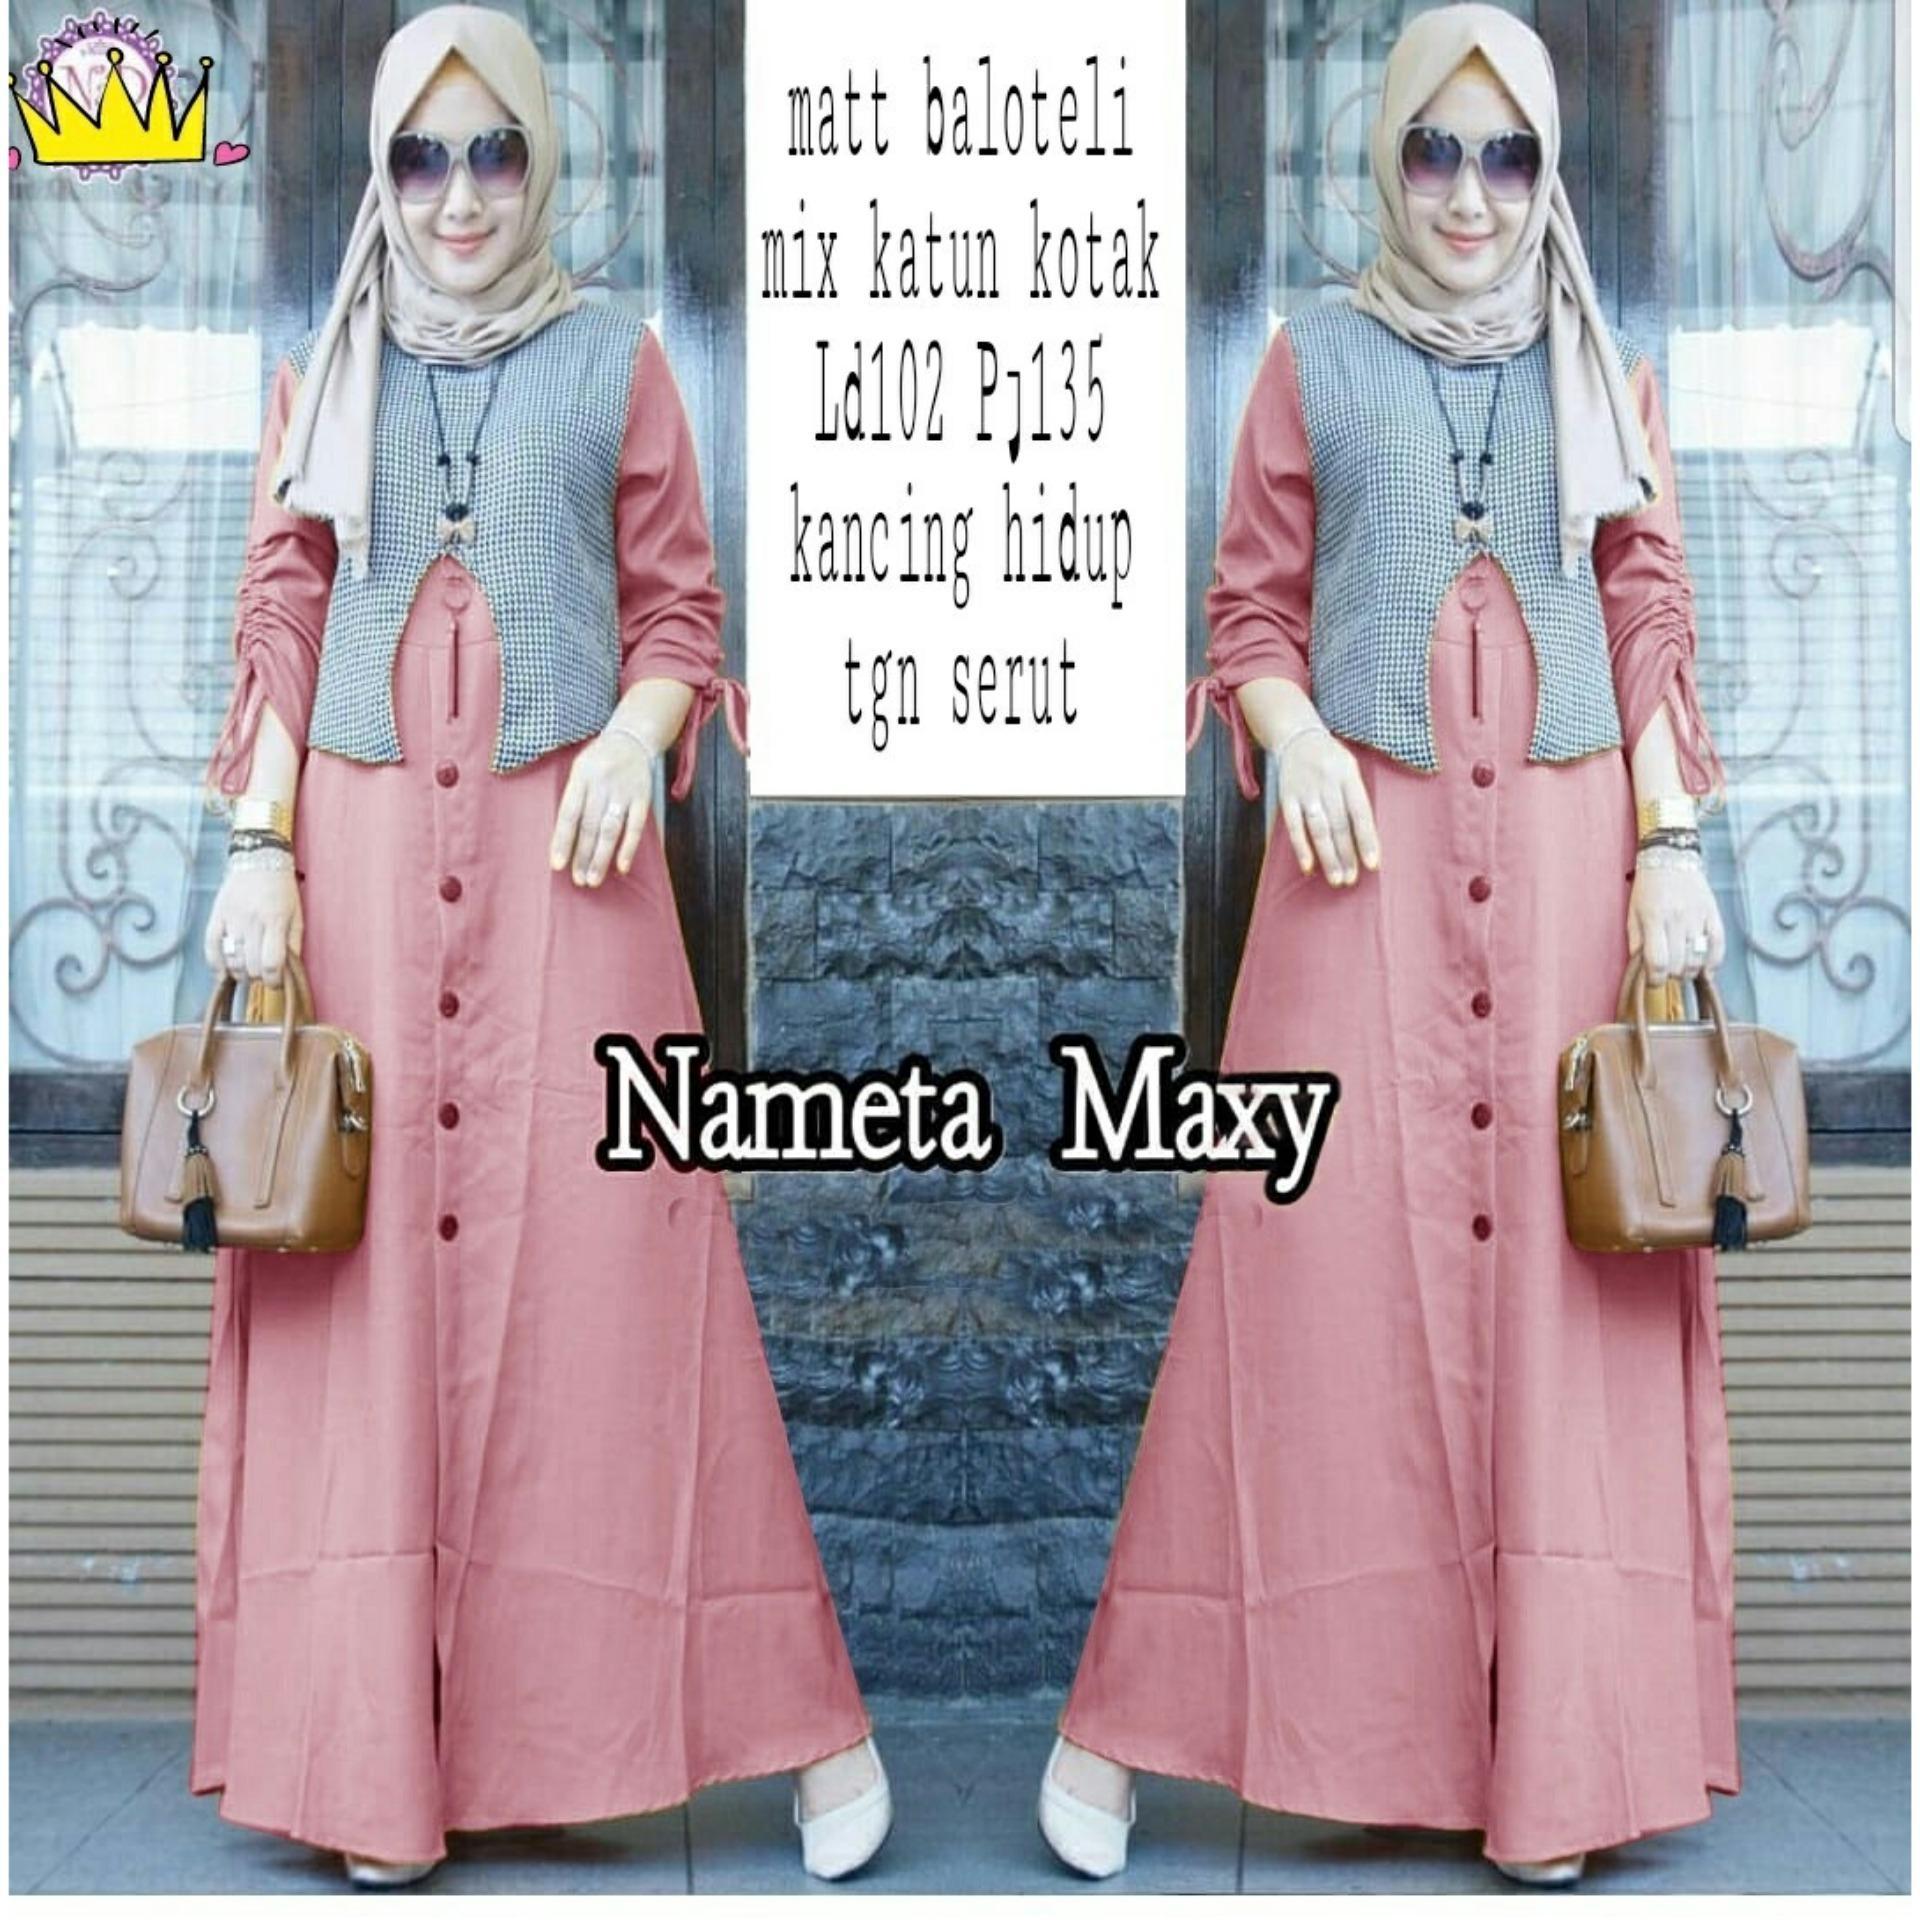 Features Amorshop Gamis Maxy Lira Pakaian Muslim Wanita Long Dress